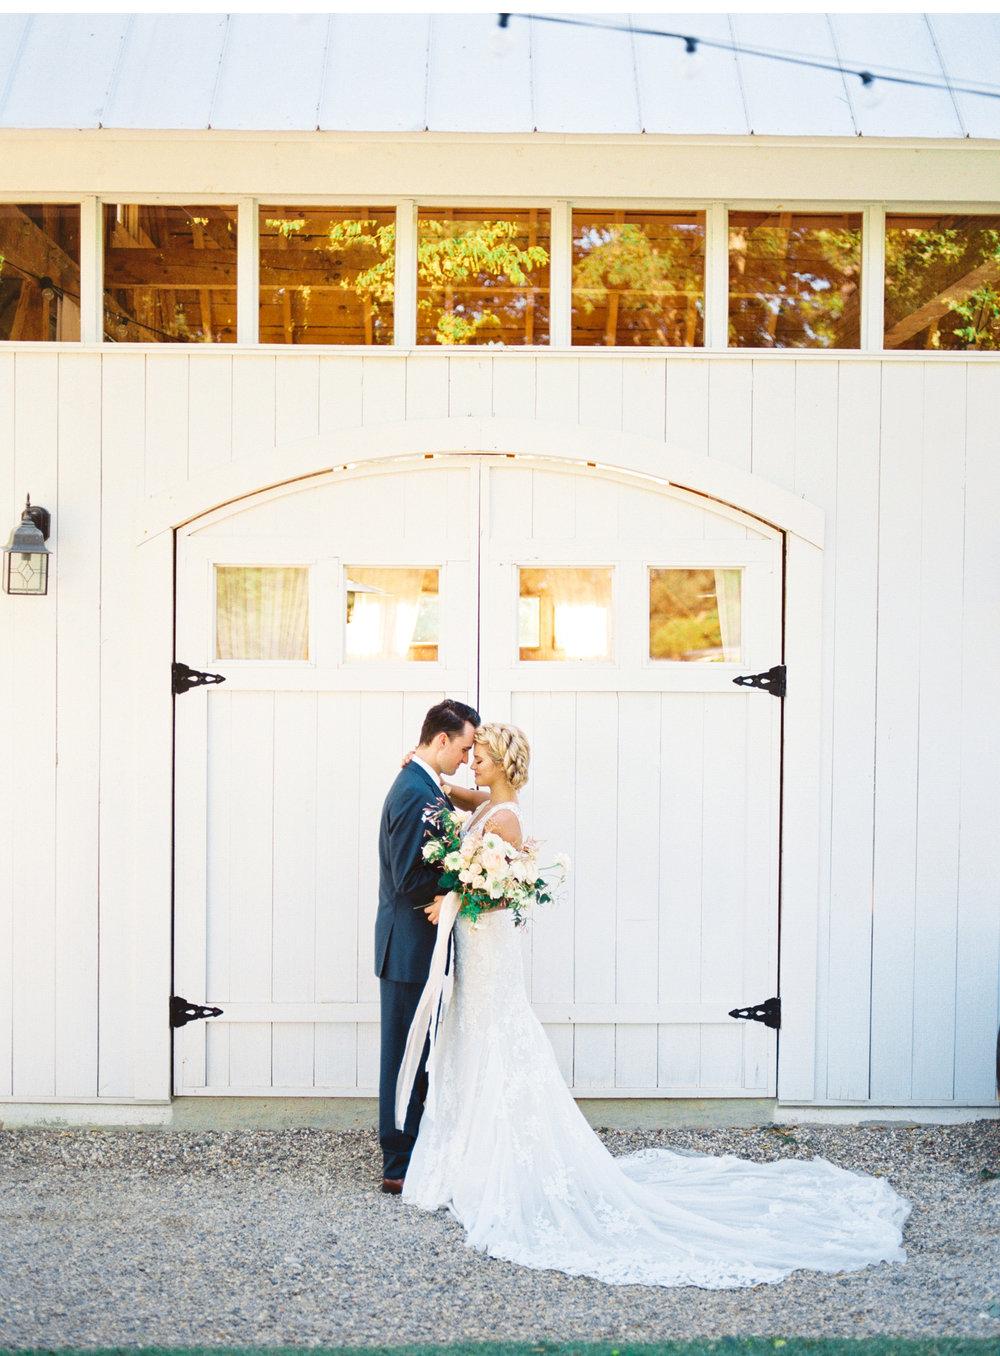 Southern-California-Wedding-Natalie-Schutt-Photography_13.jpg